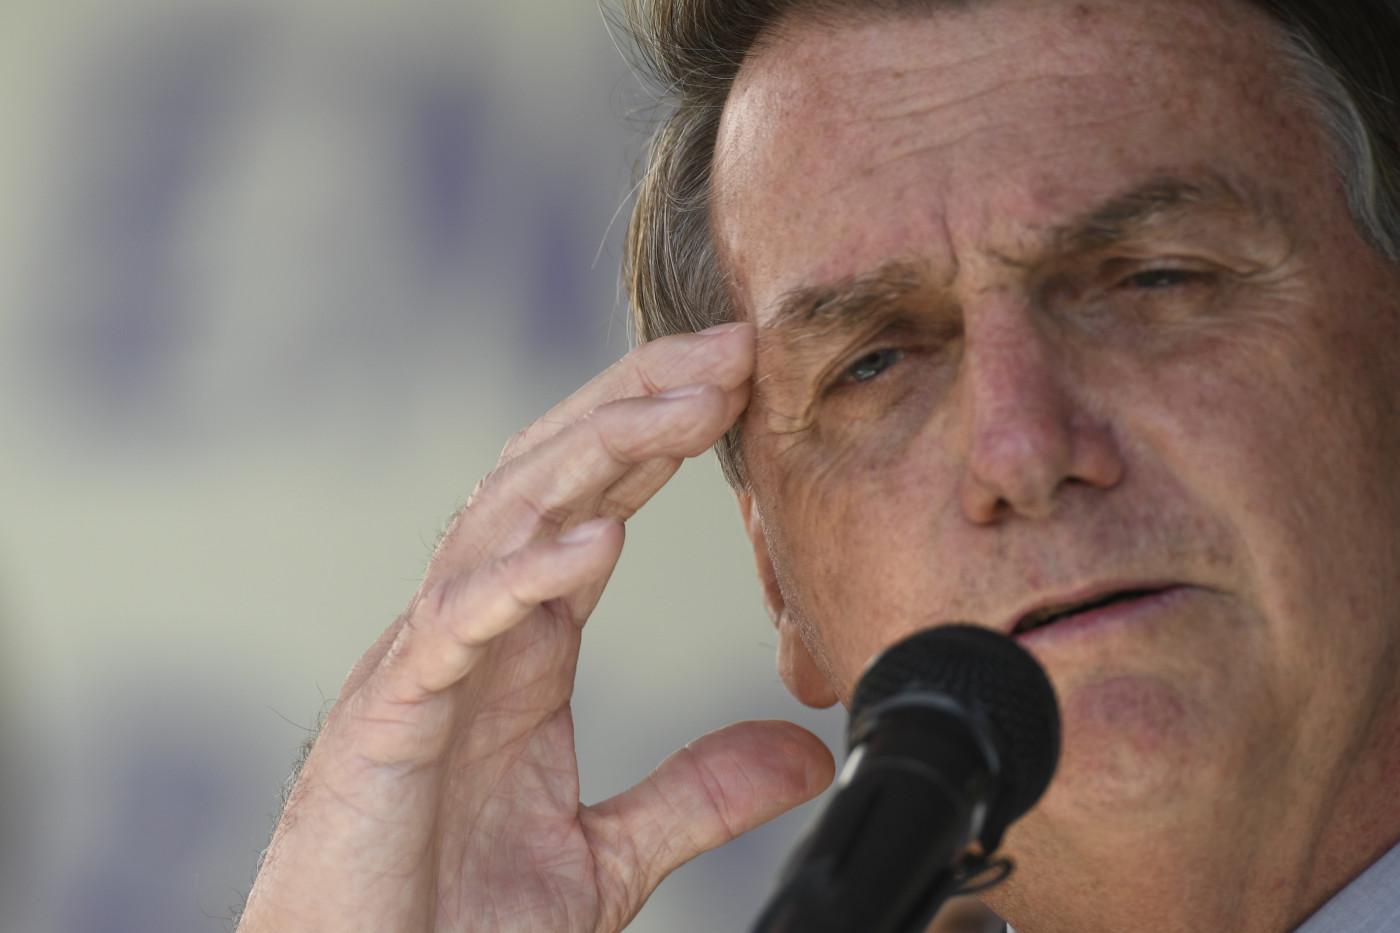 O presidente da república, Jair Bolsonaro, durante pronunciamento